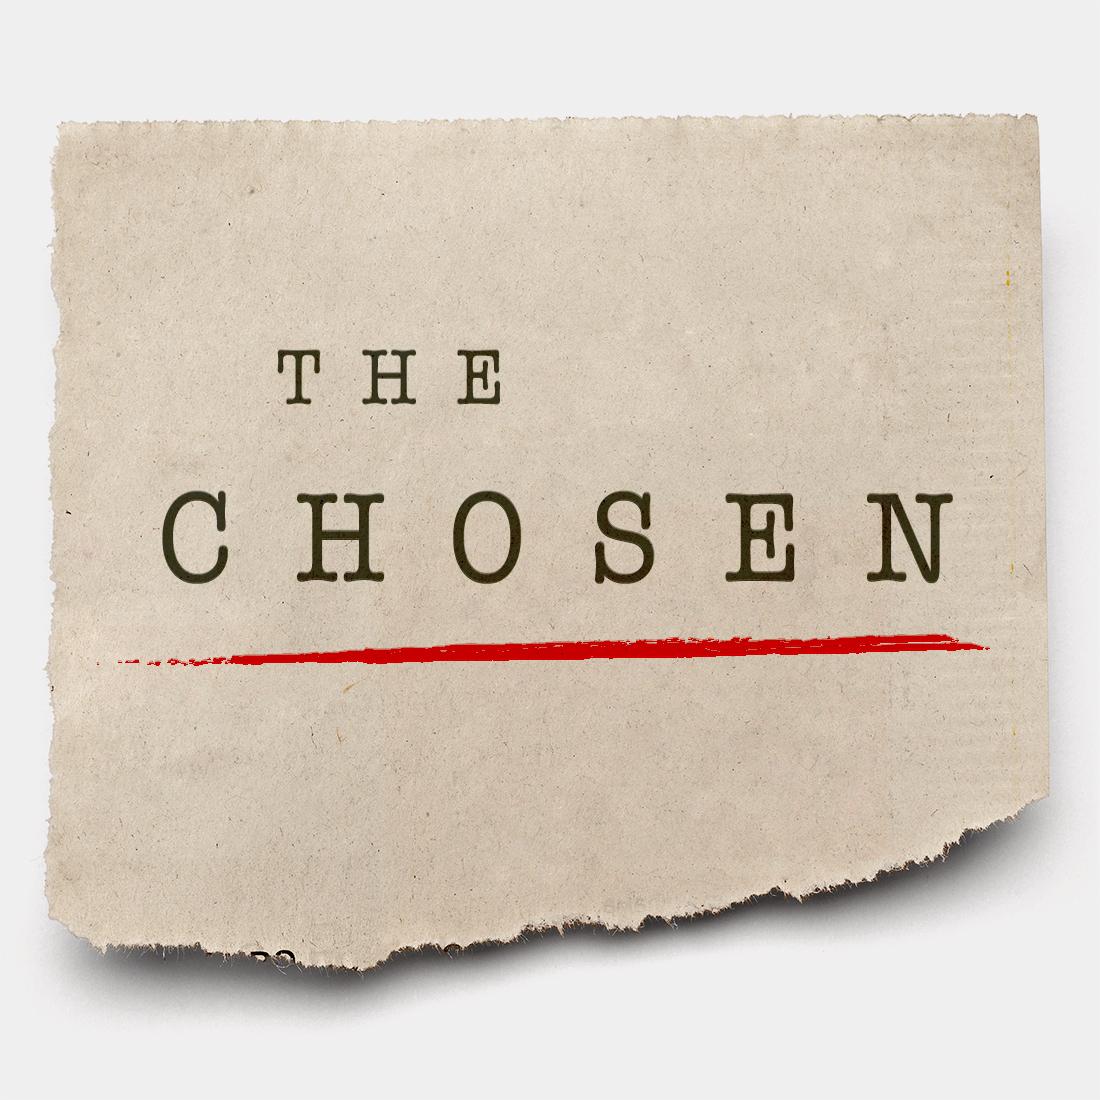 TheChosen_Deliver.jpg